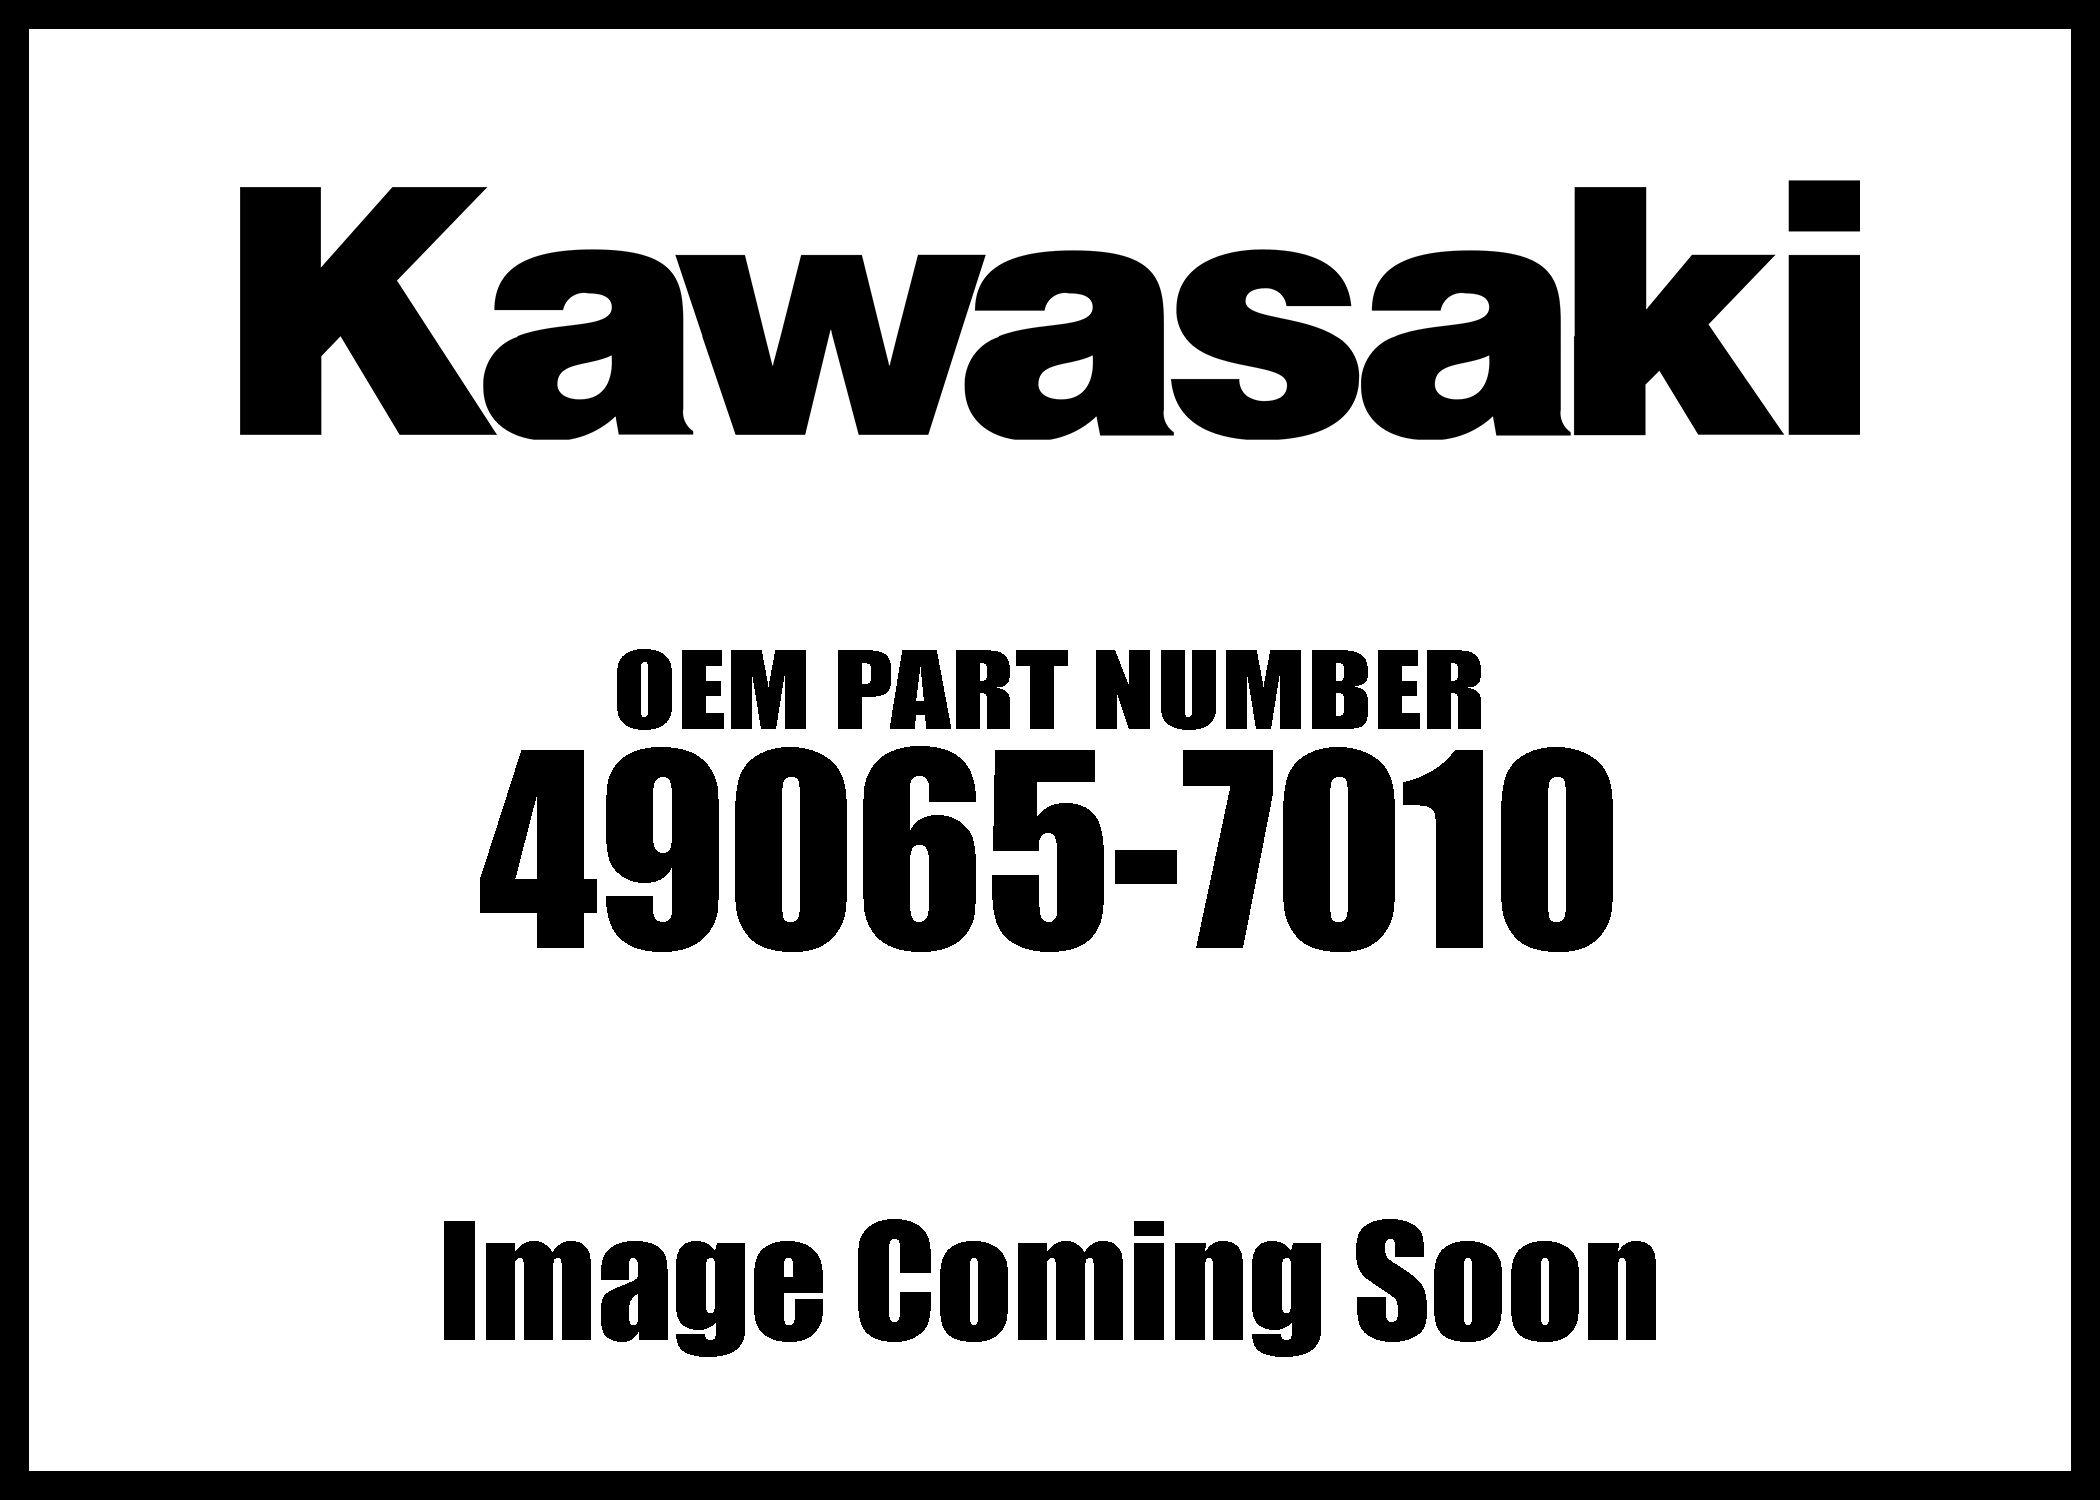 Kawasaki Mule 600 Mule Sx 4x4 Xc Camo Oil Filter